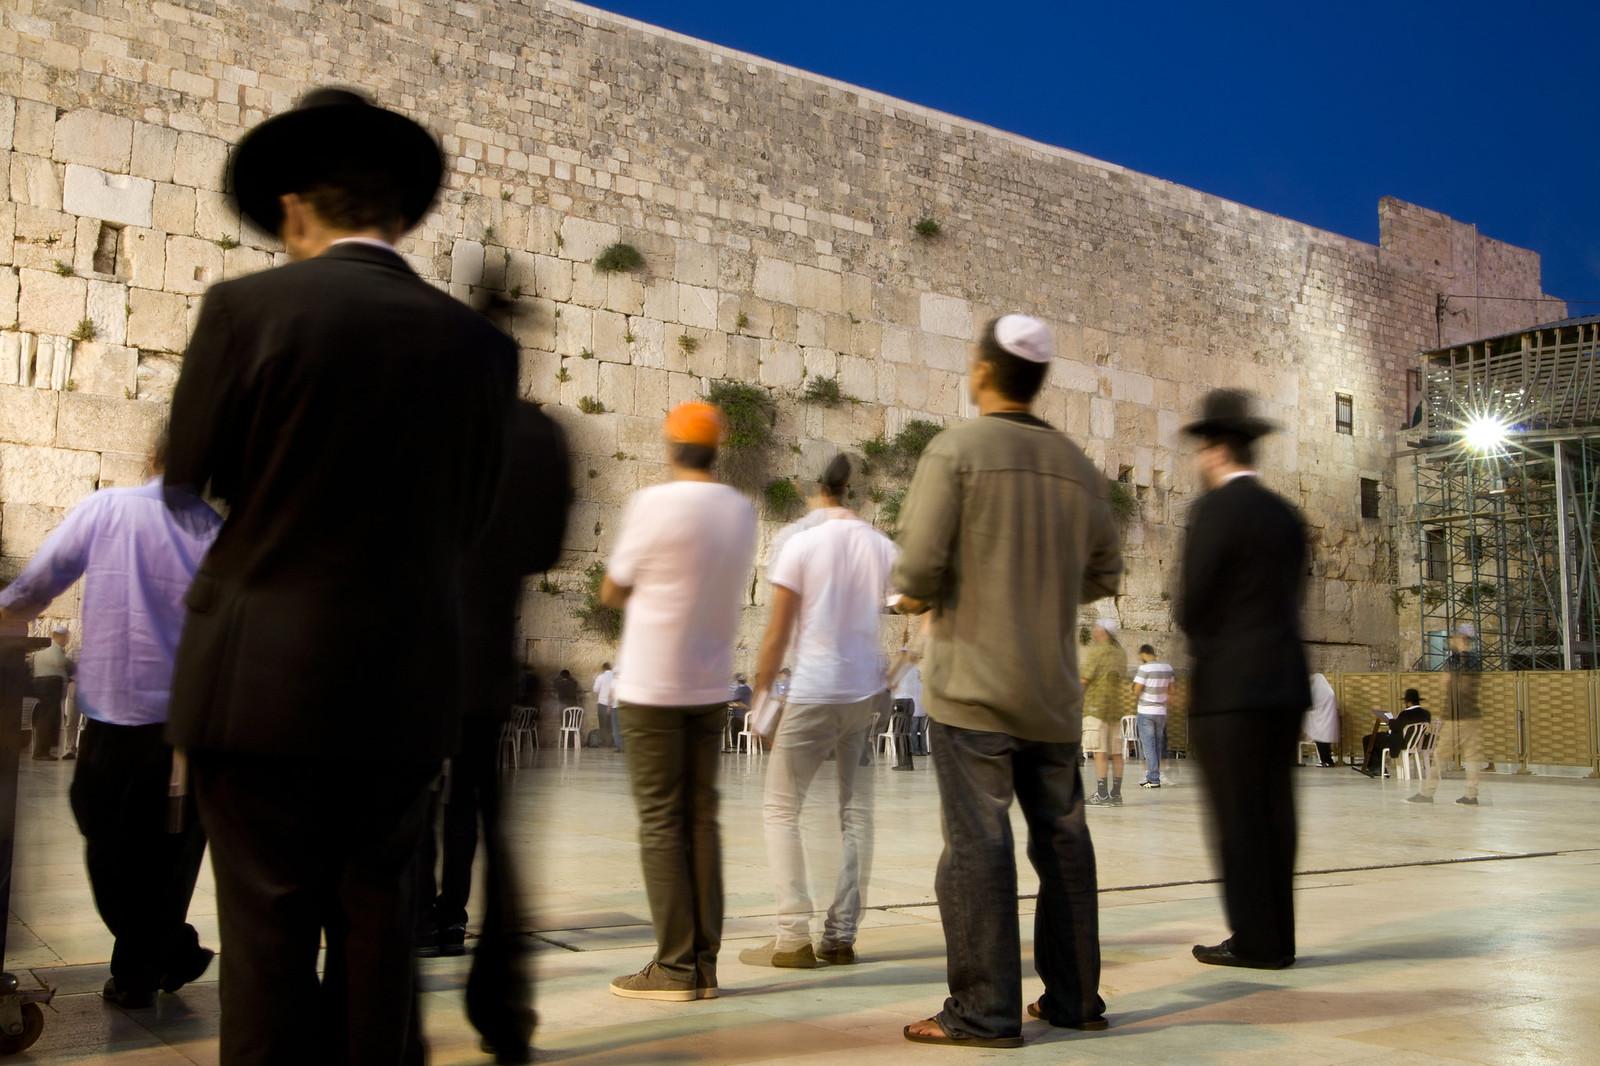 Jerusalem_Western Wall_7_Noam Chen_IMOT